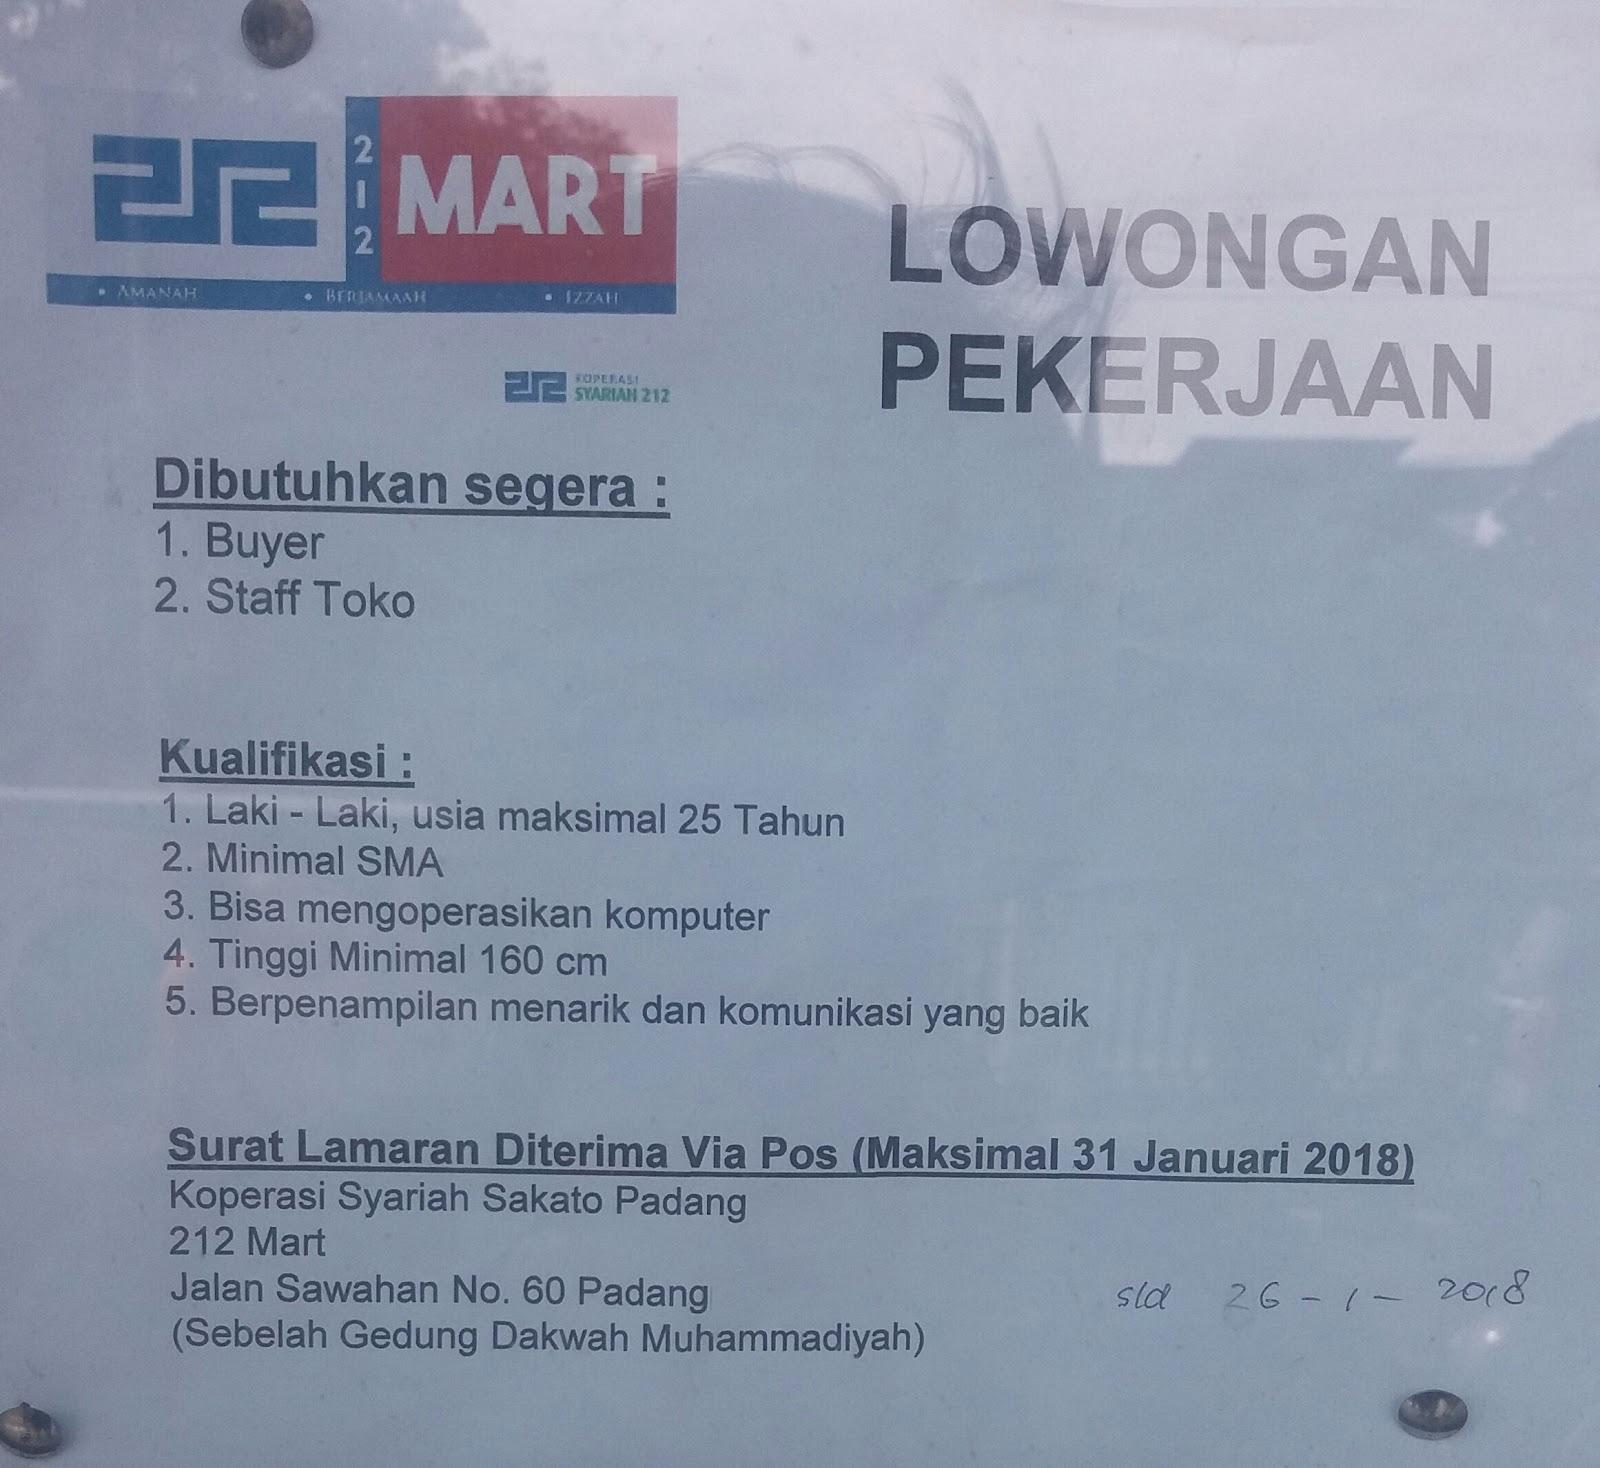 Ilmu Pengetahuan 1 Lowongan Kerja Terbaru Kota Padang